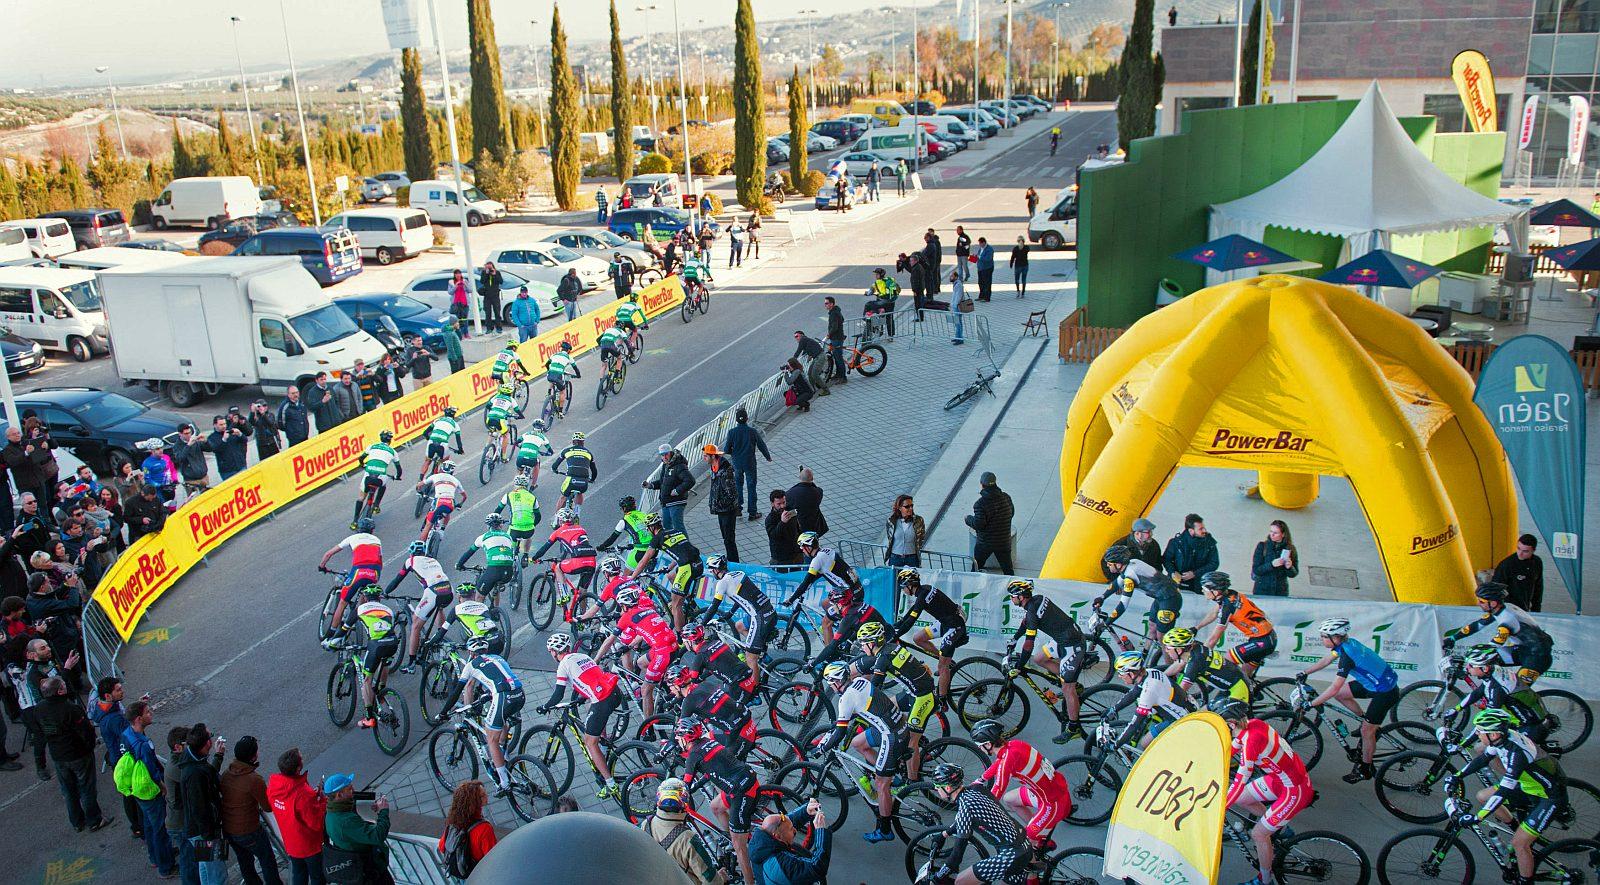 andalucia_bike_race_poor_brigitta_03